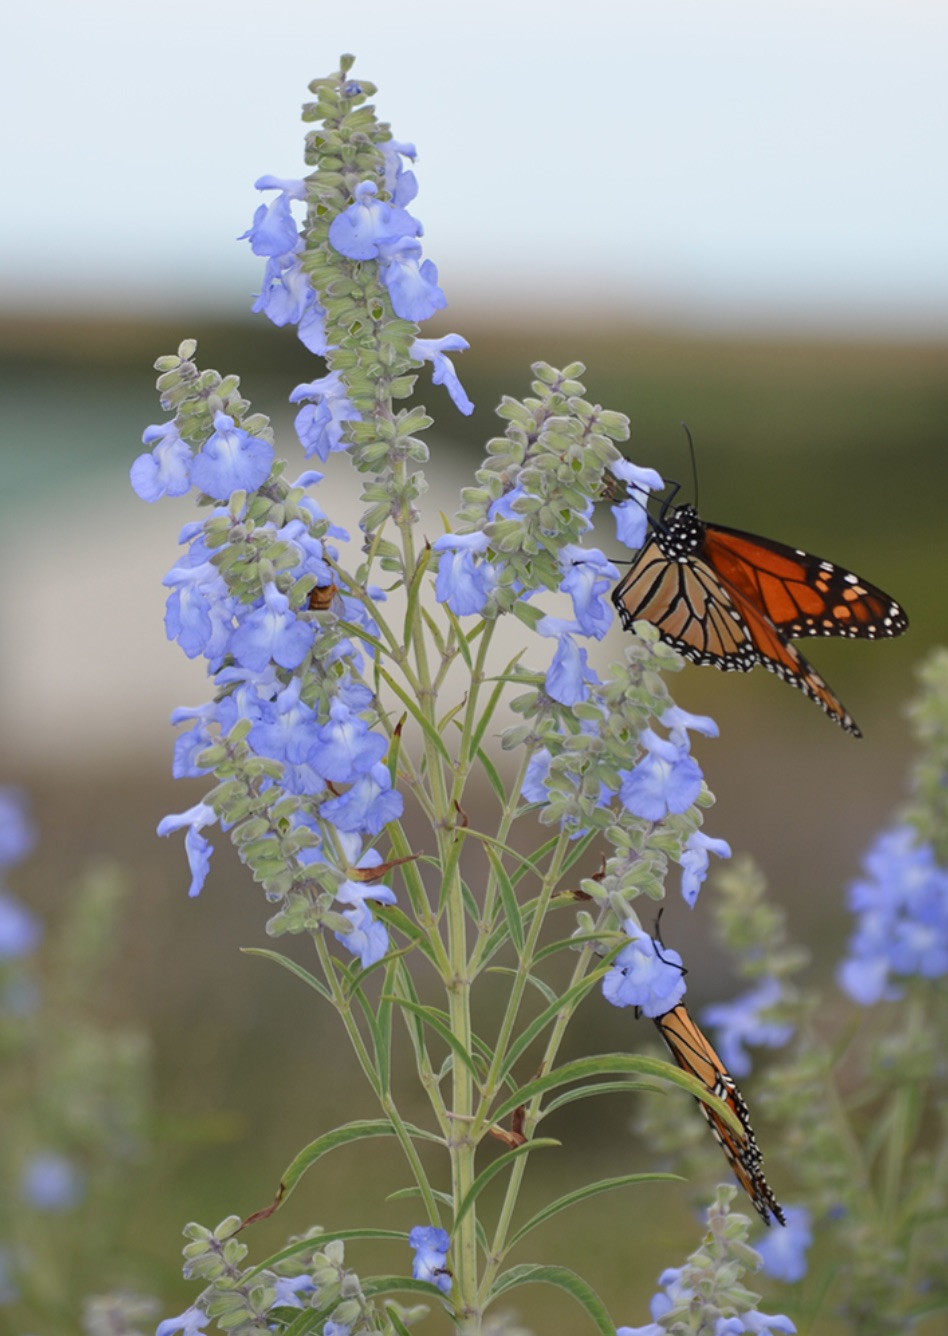 Plants that Attract Monarch Butterflies Salvia azurea or Blue Sage #MonarchButterflies #Butterflies #SavetheMonarchs #Gardening #Plants #GardenPollinators #AttractMonarchButterflies #NectarRichPlants #BeneficialForPollinators